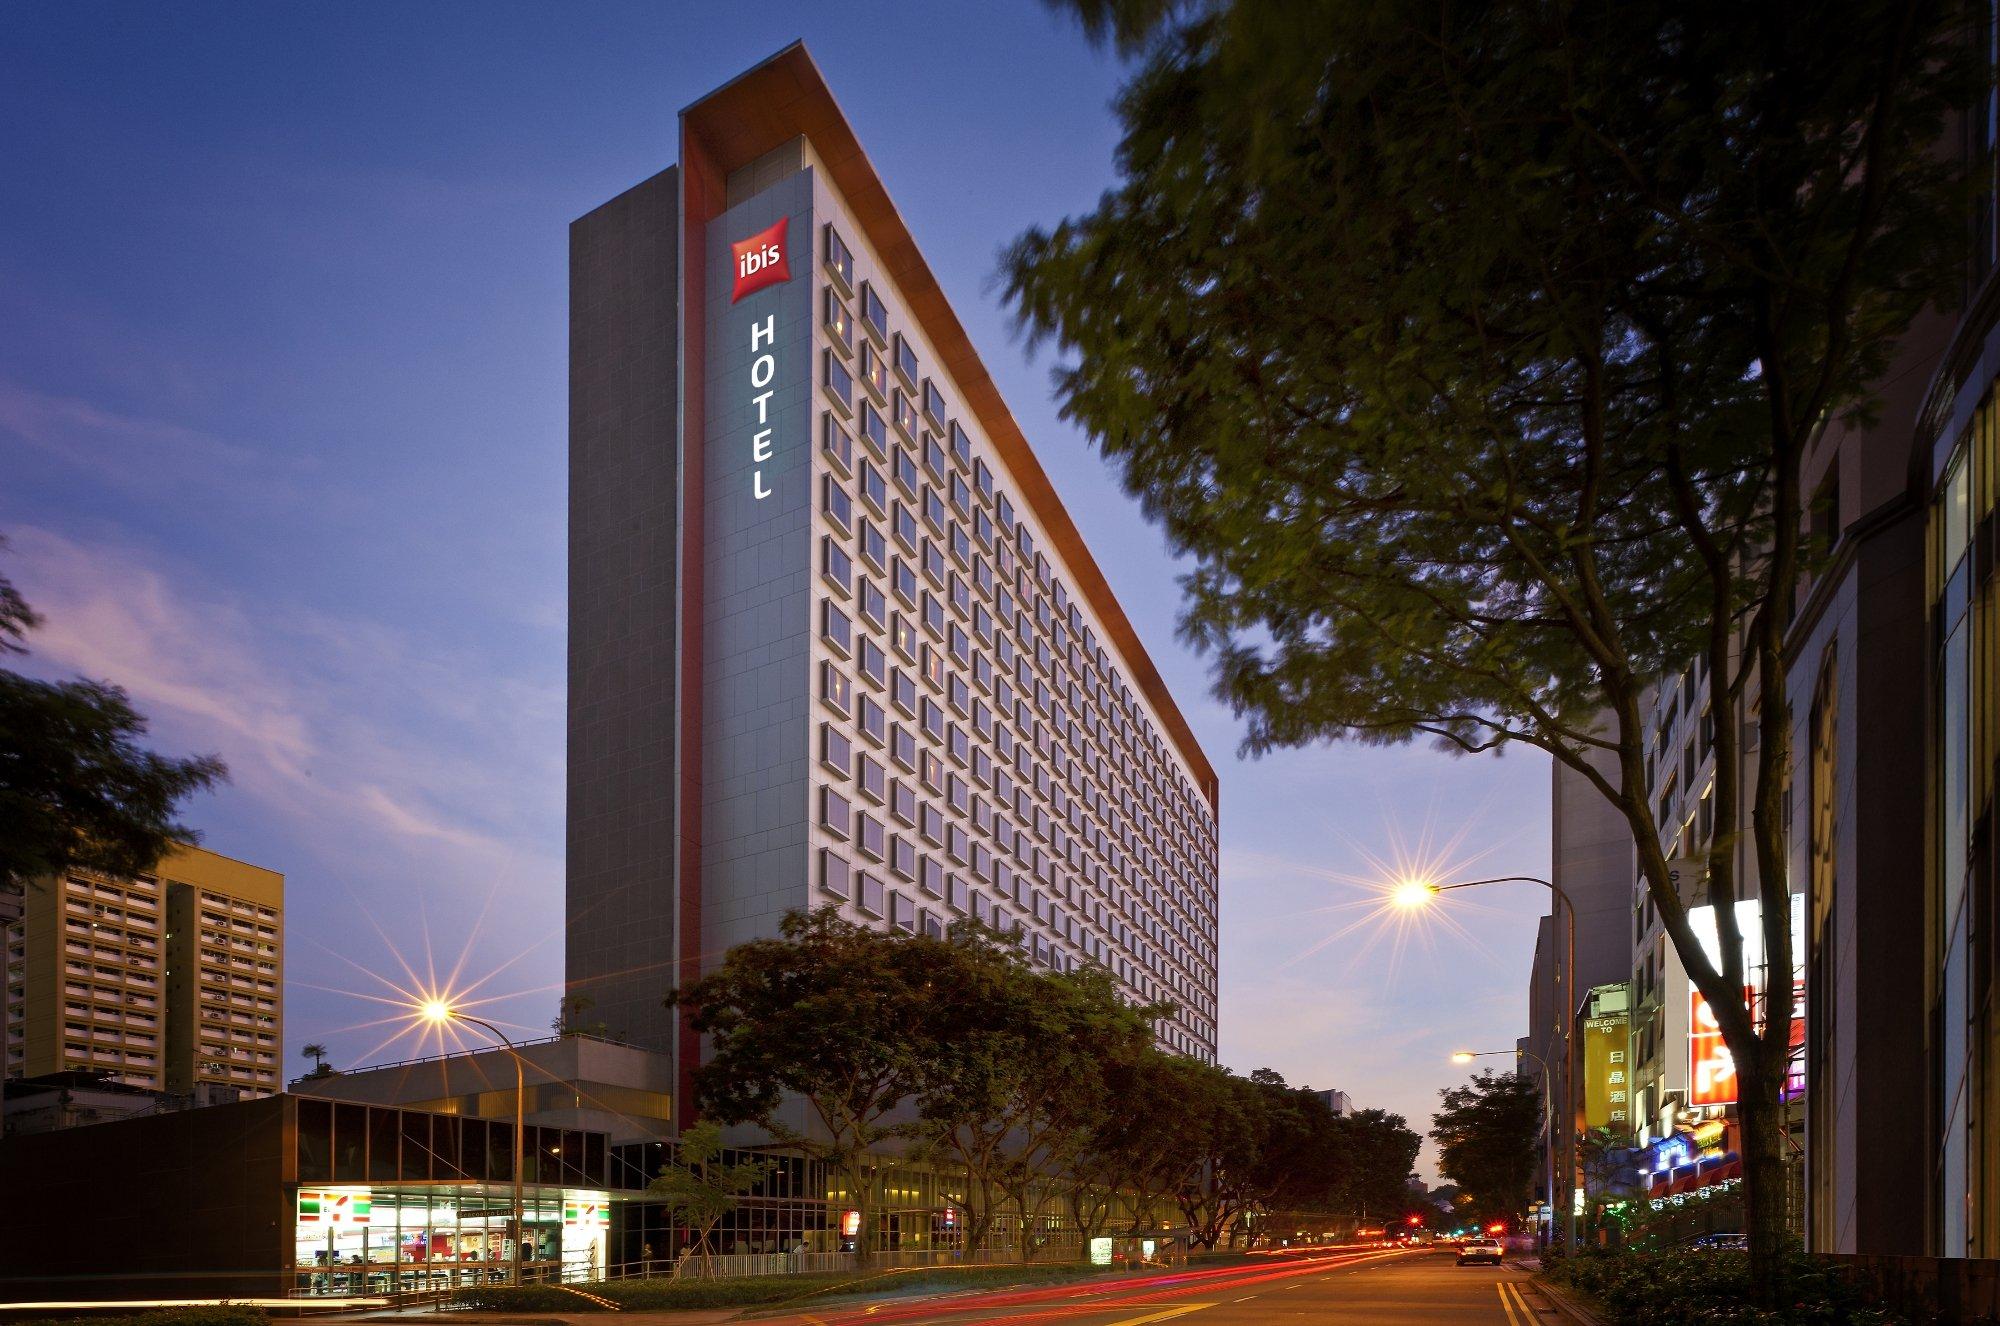 Ibis Singapore on Bencoolen